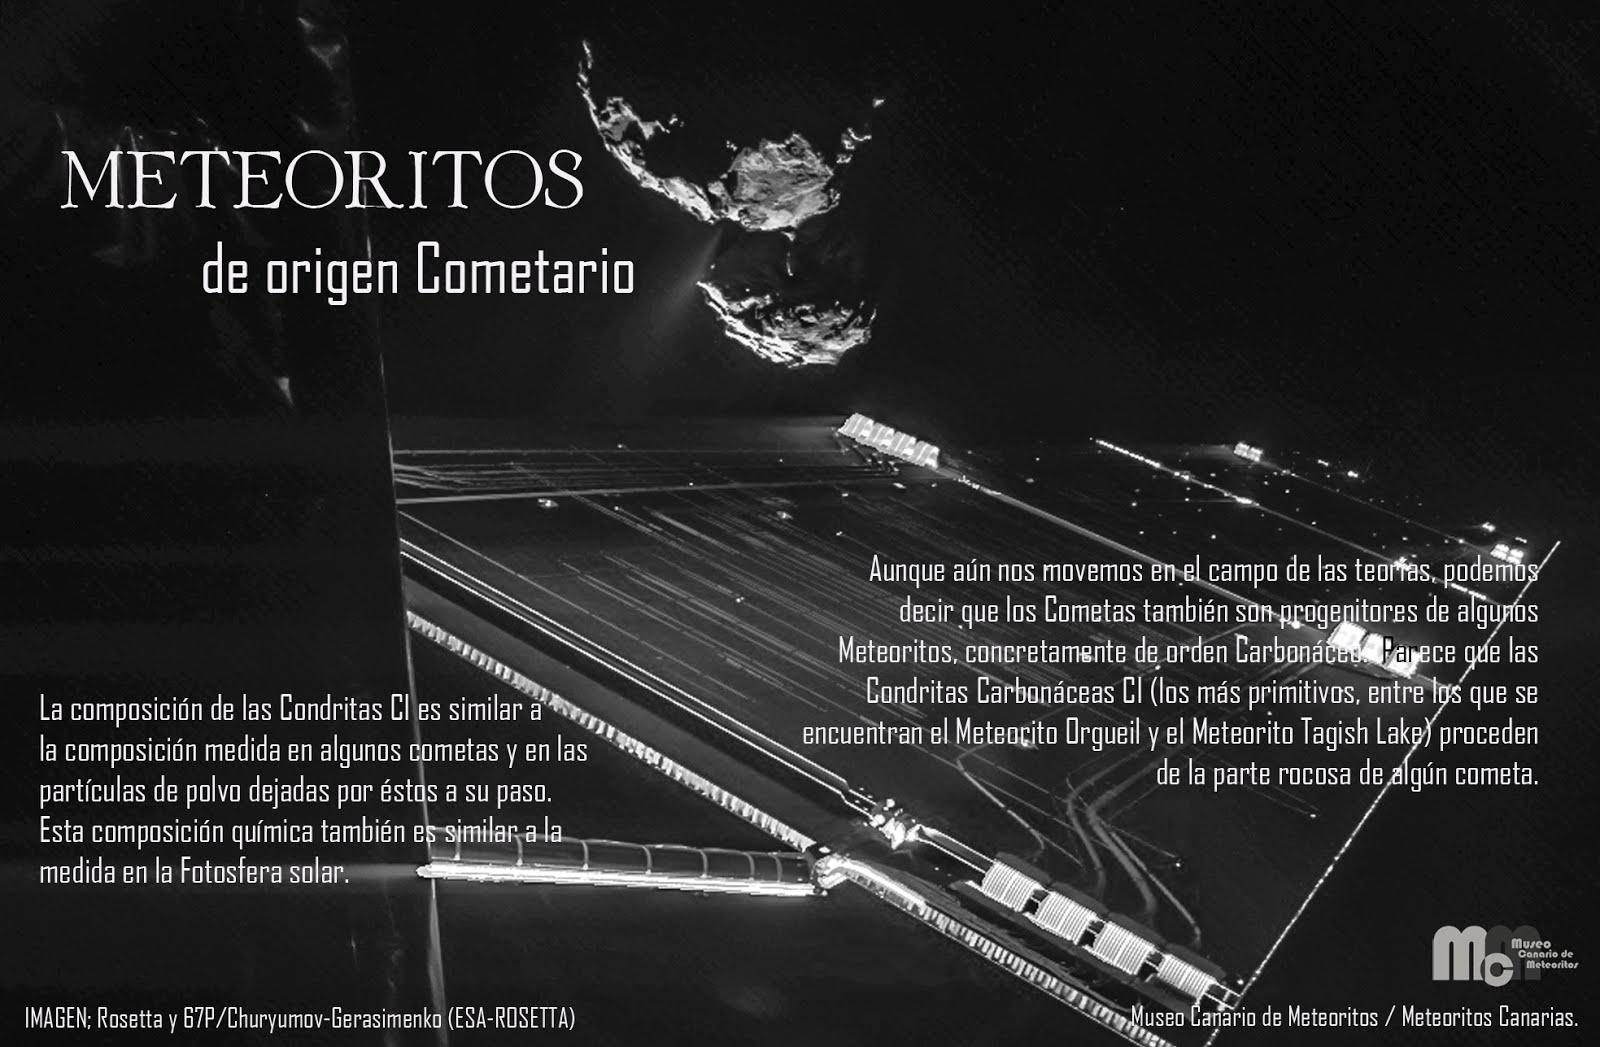 Cometary meteorites